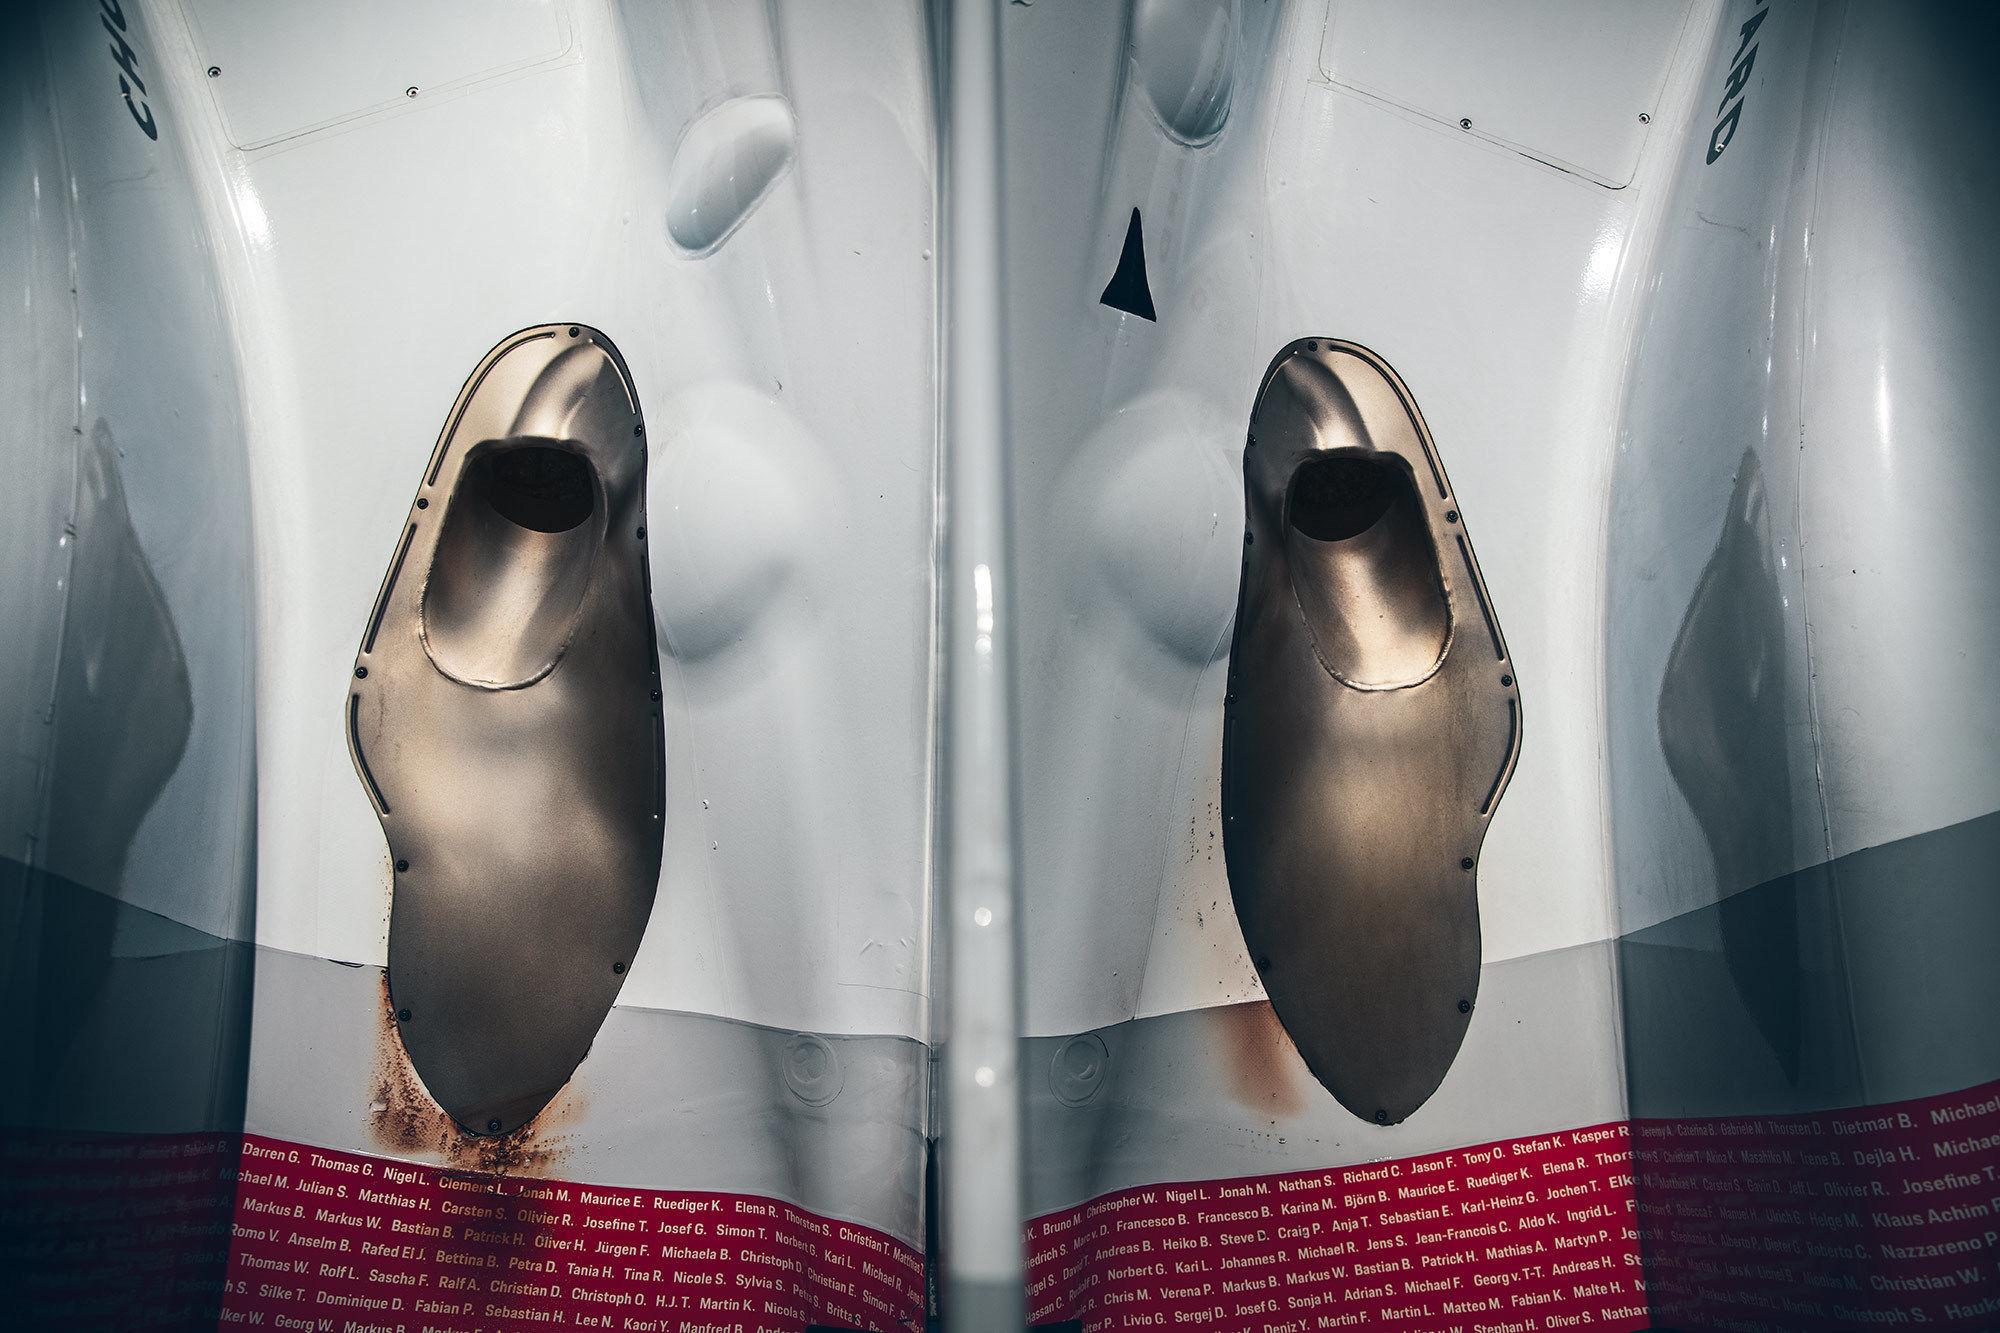 THOMAS SCHORN - PORSCHE 919 HYBRID EVO / REPRESENTED BY BANRAP / CLIENT - PORSCHE / AGENCY - KEMPER KOMMUNIKATION